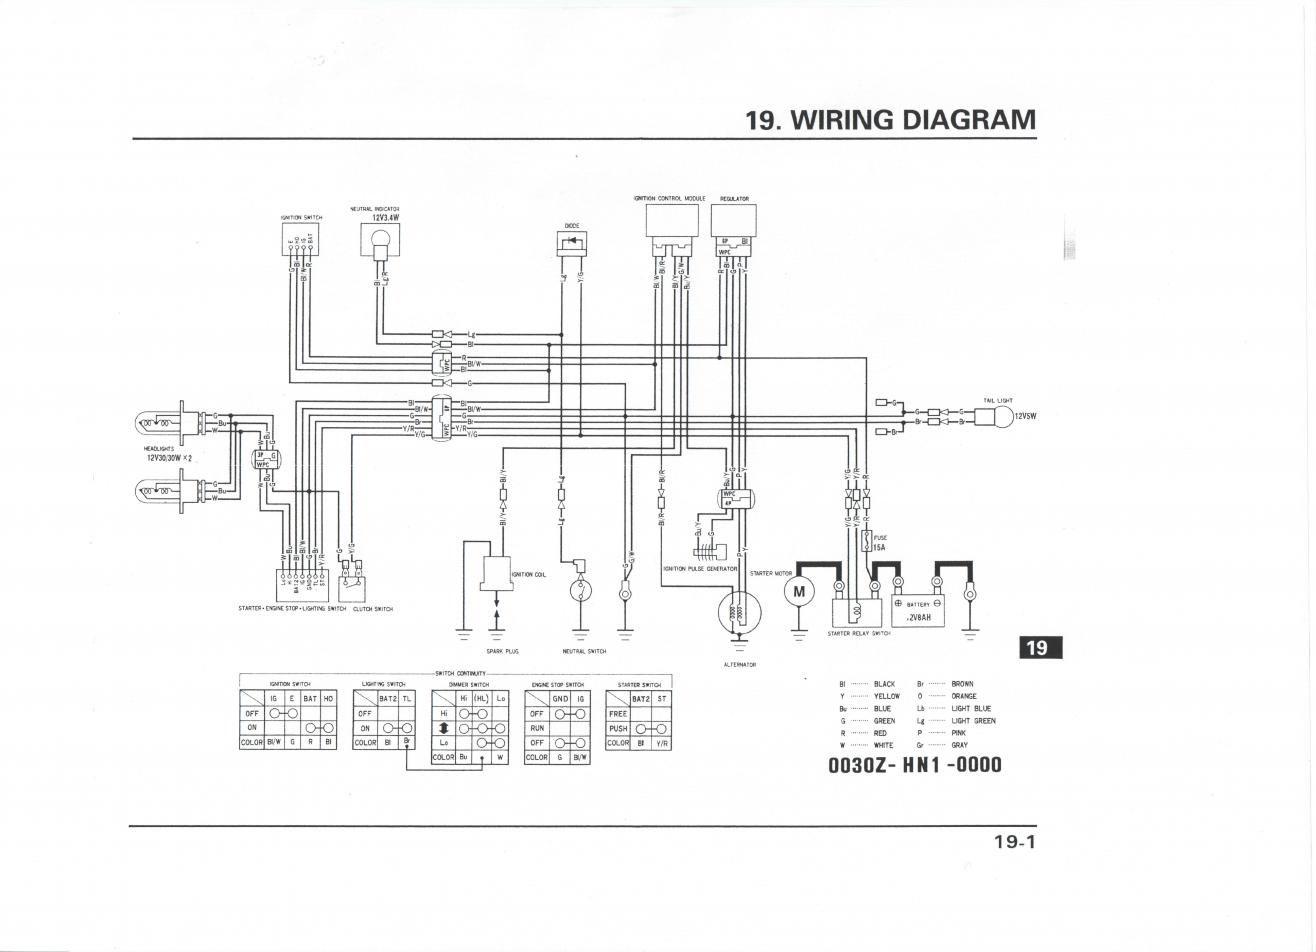 hight resolution of trx300ex wiring diagram wiring diagrams suzuki rm 250 wiring diagram trx 300ex wiring diagram